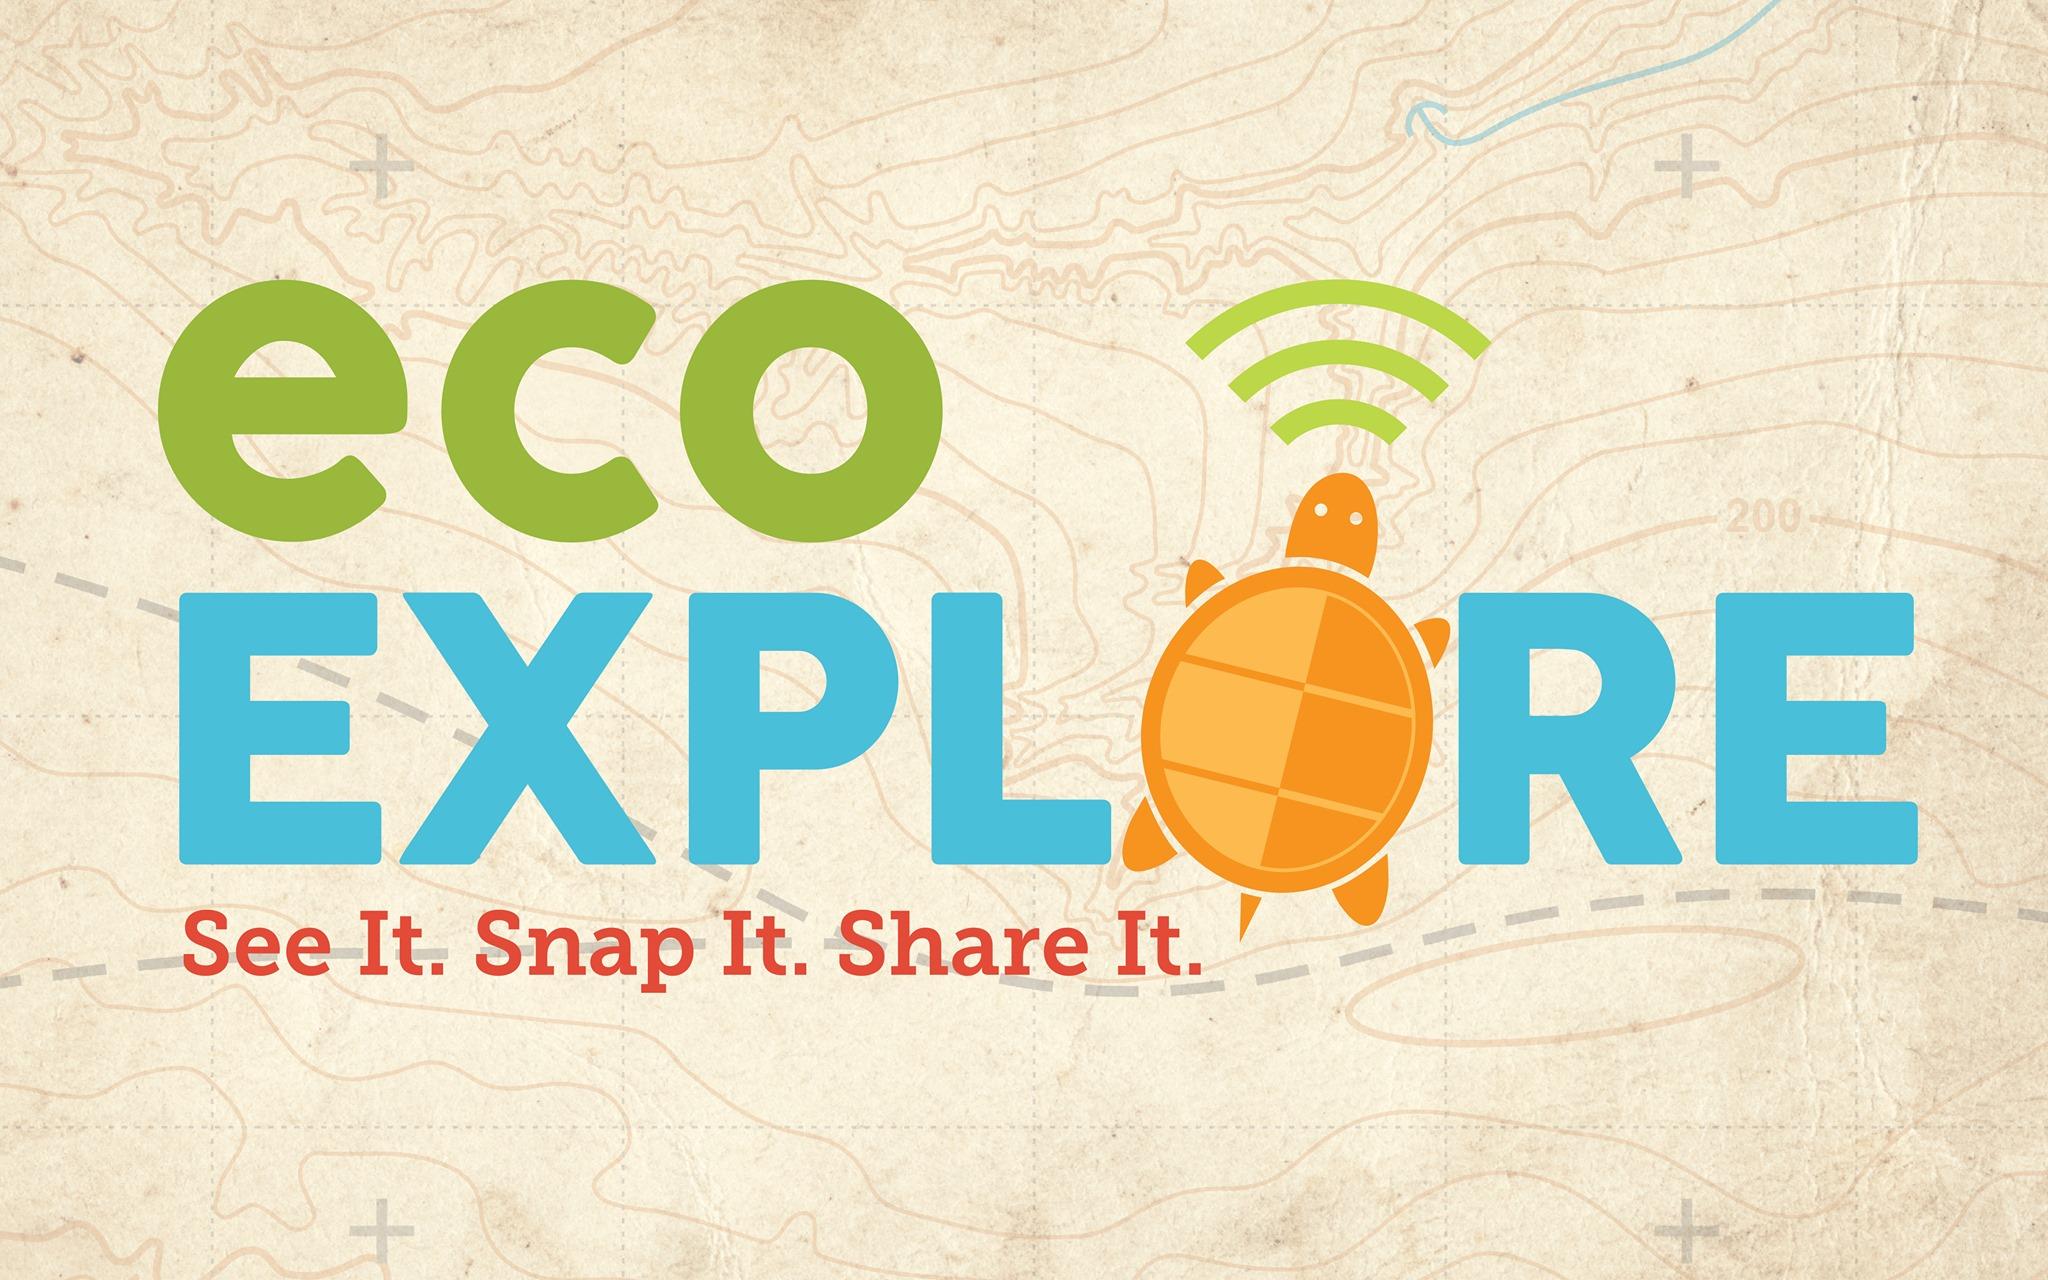 Intro to ecoEXPLORE and the City Nature Challenge